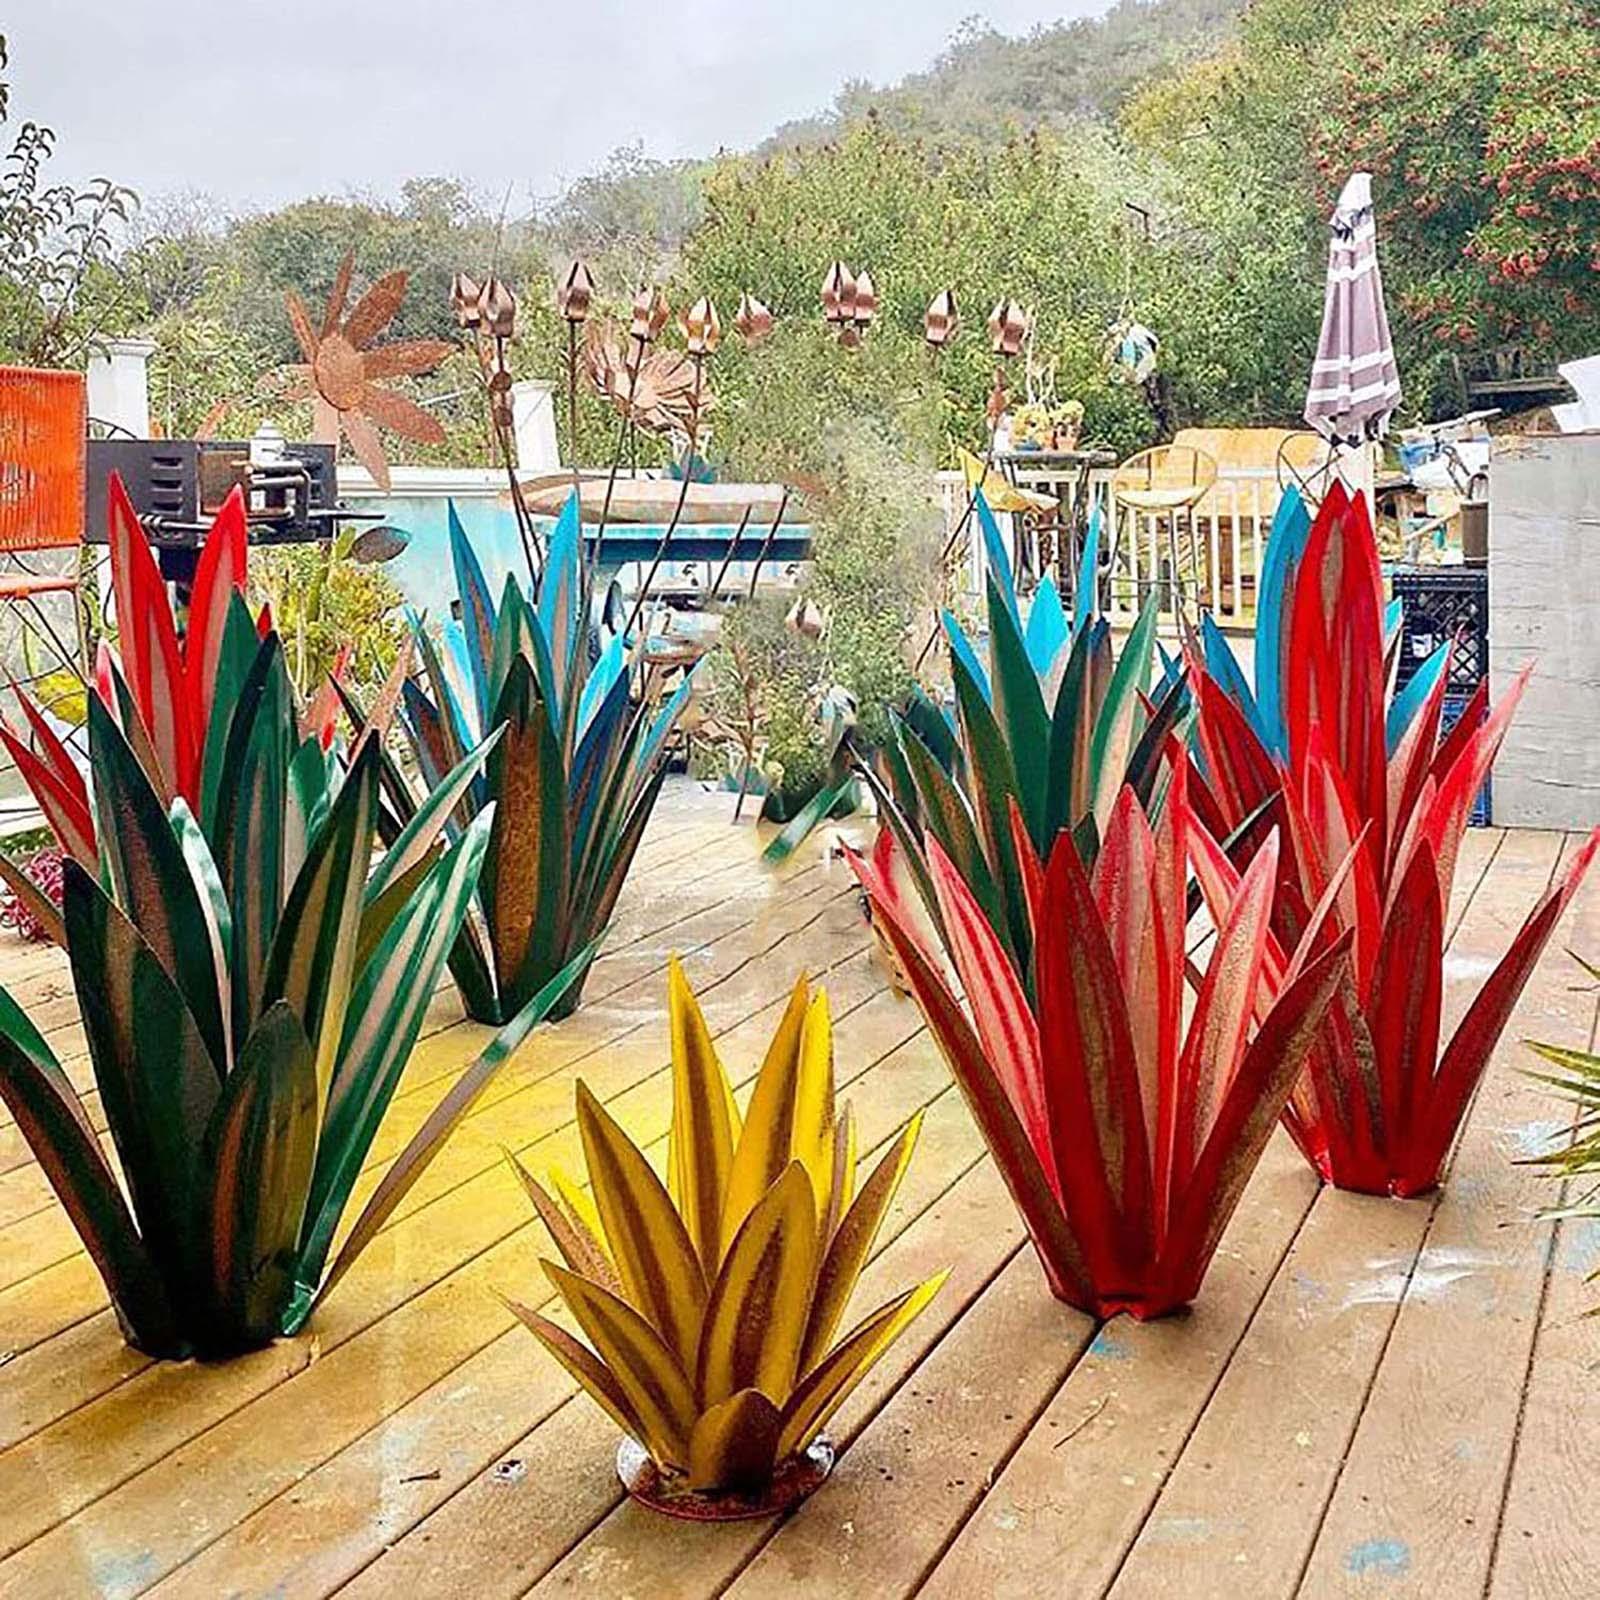 Art Tequila Rustic Sculpture Garden Decoration Yard Sculpture Home Decor tuin decoratie jardin 9 Leaves Free Shipping